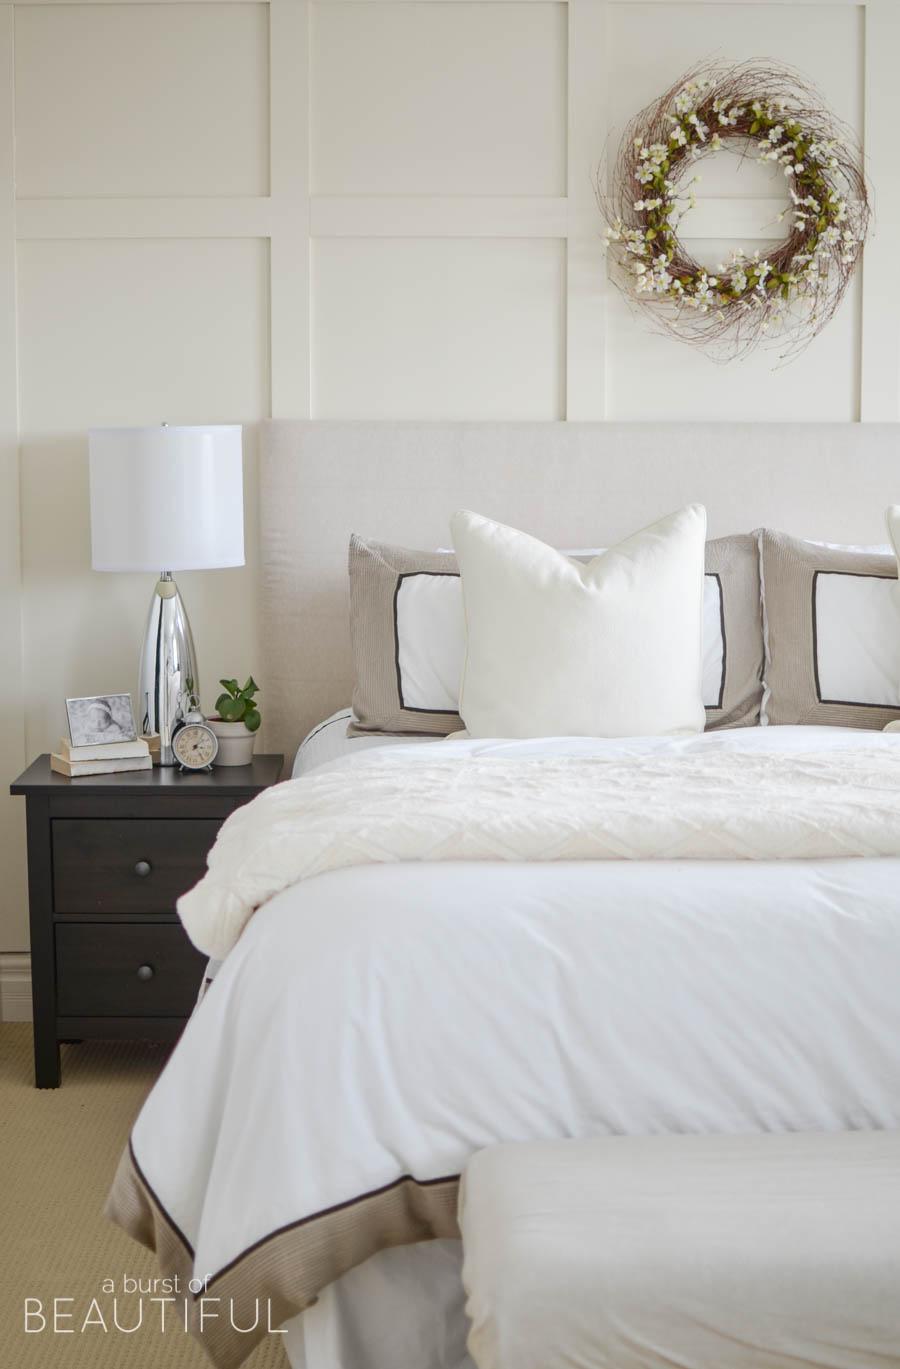 Bedroom board and batten wall